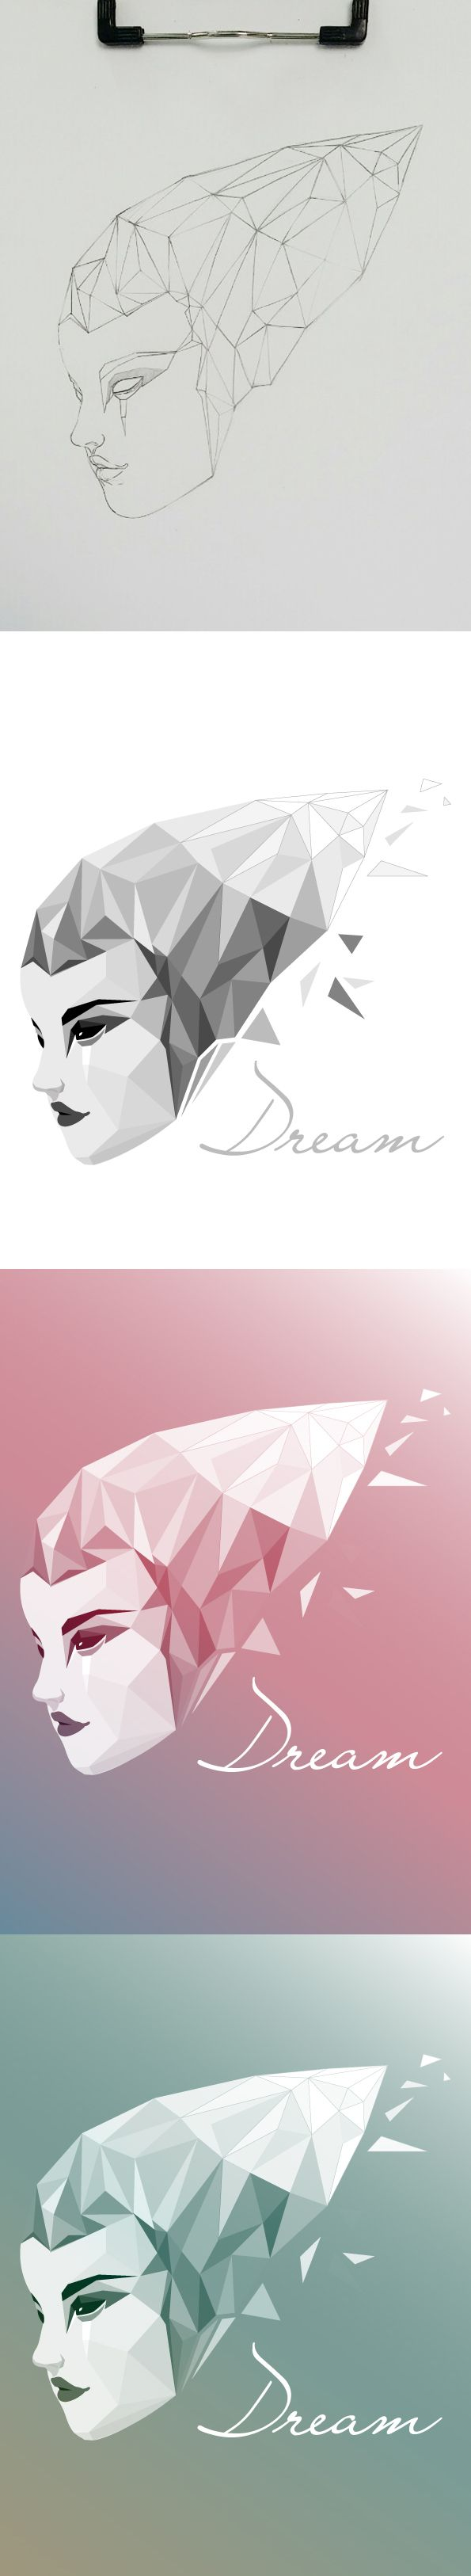 #prism #illustration # face #dream